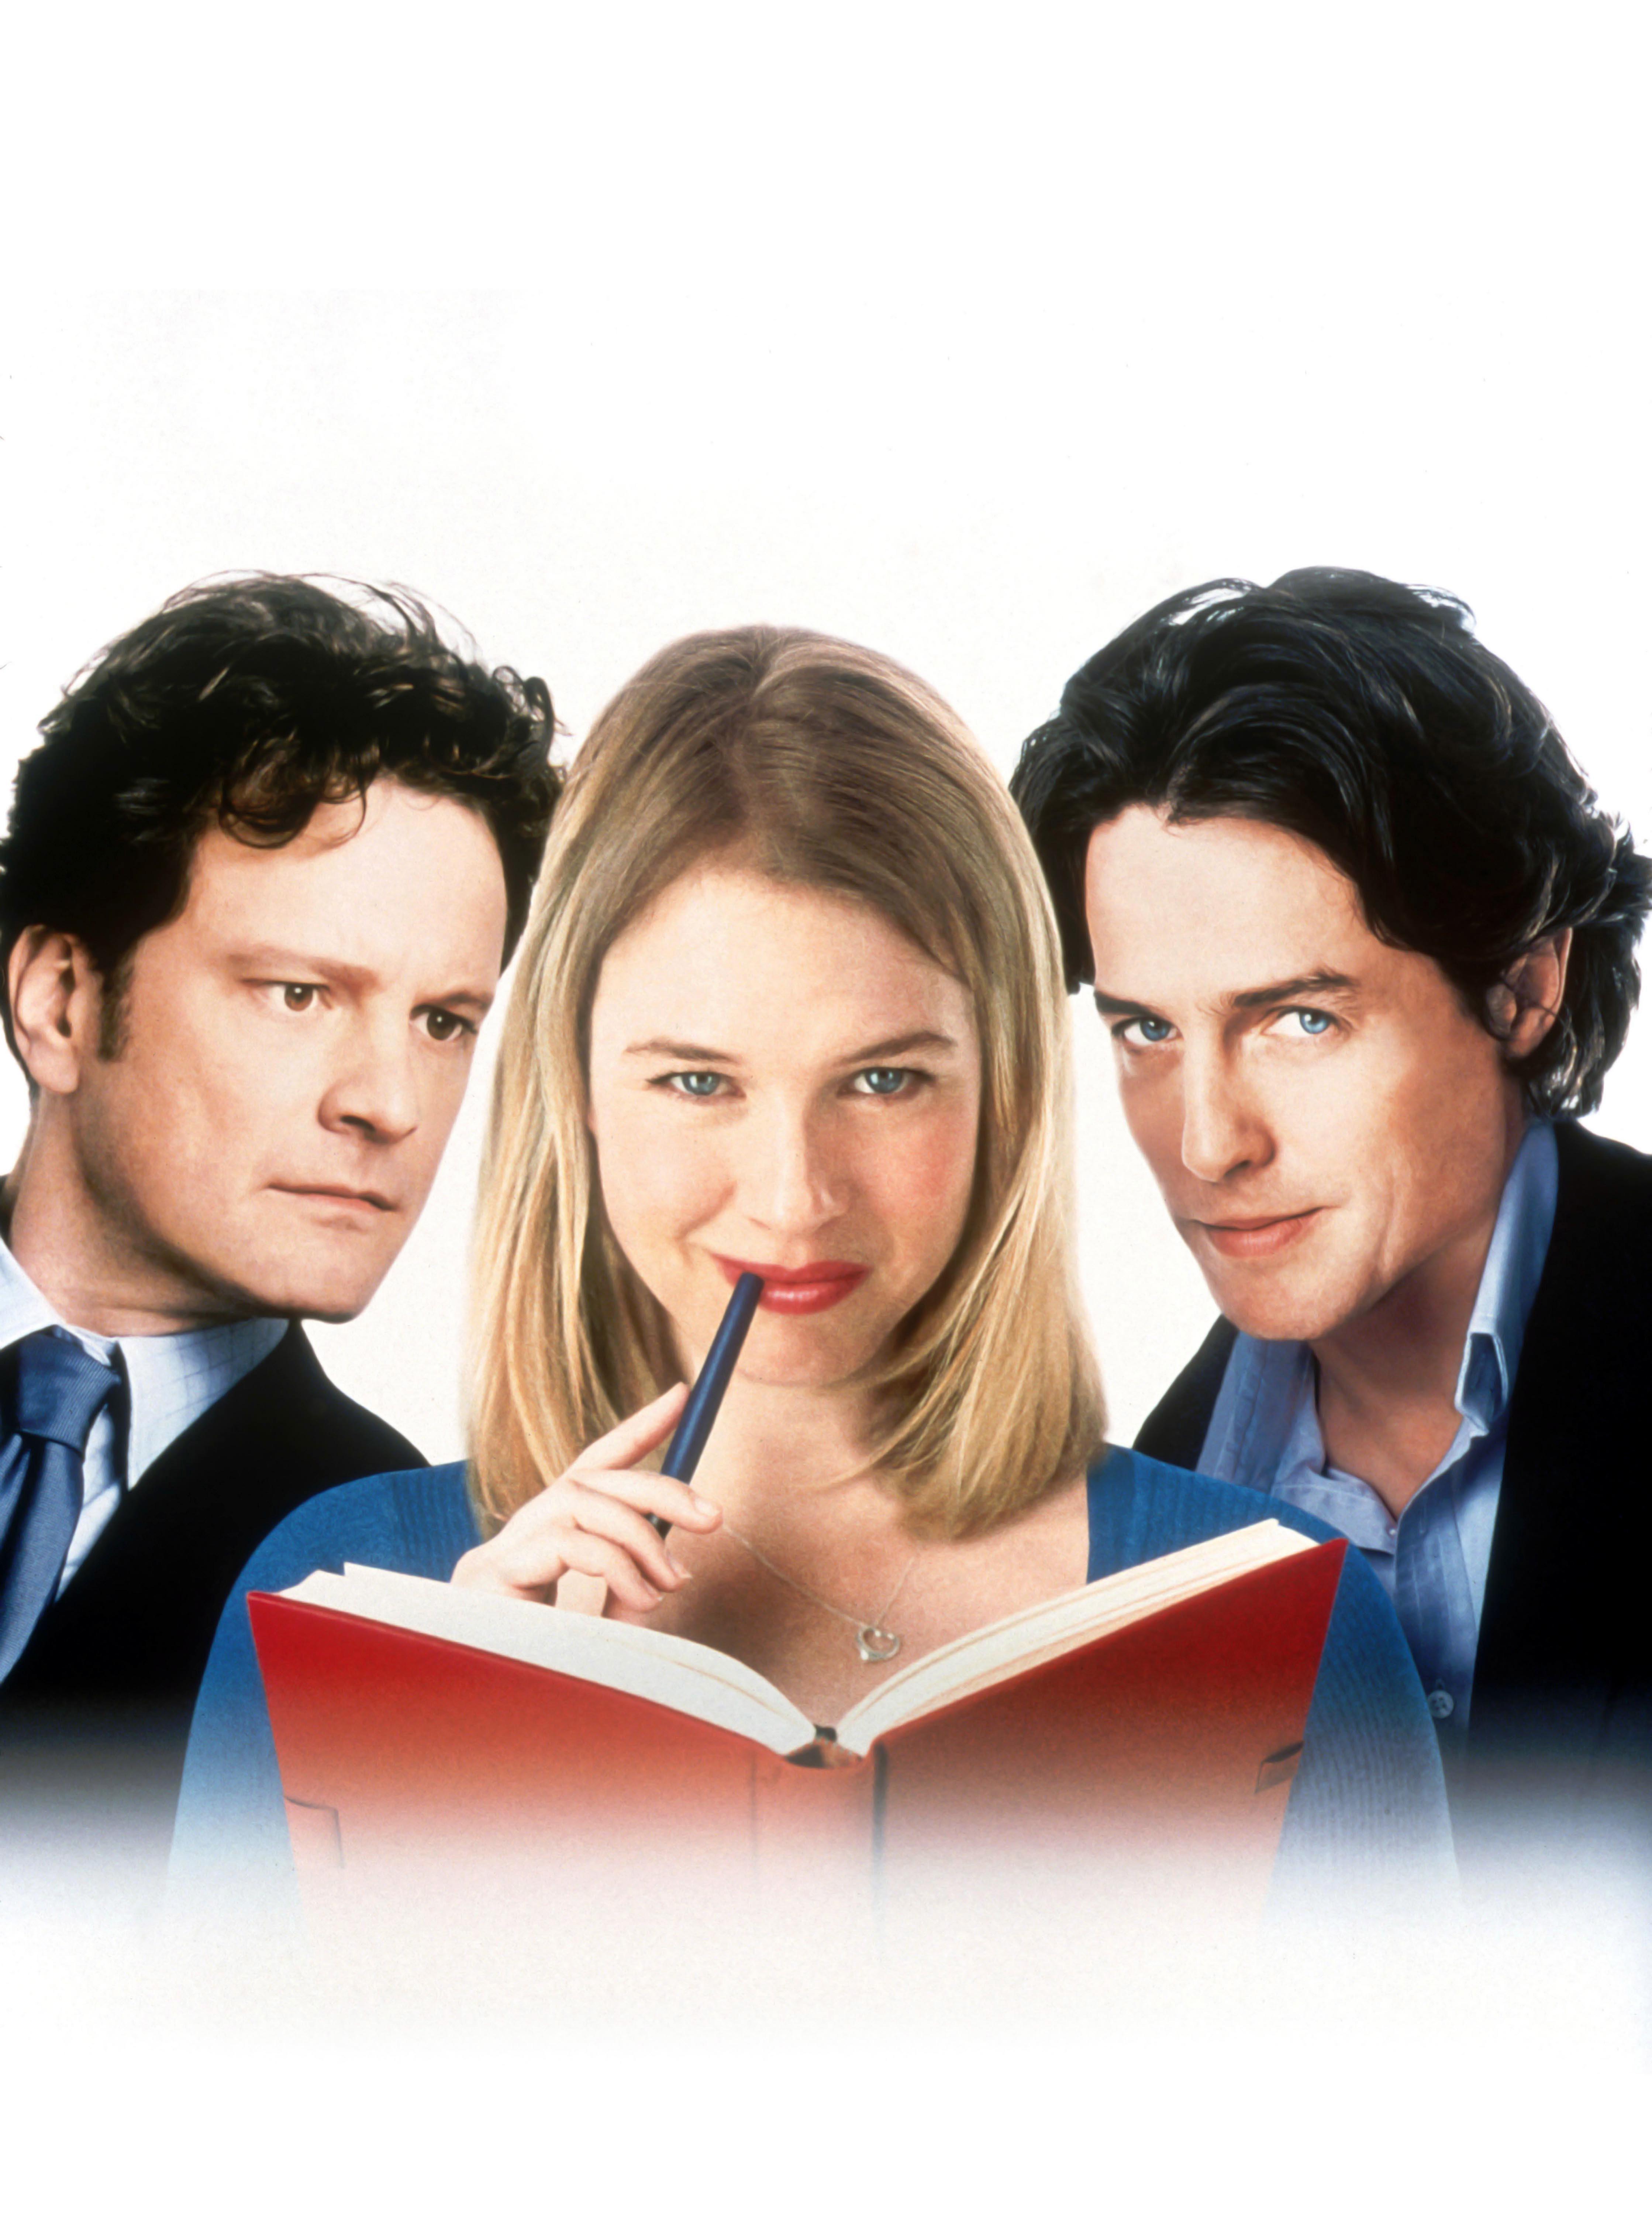 Colin Firth, Renee Zellweger, Hugh Grant, Bridget Jones's Diary